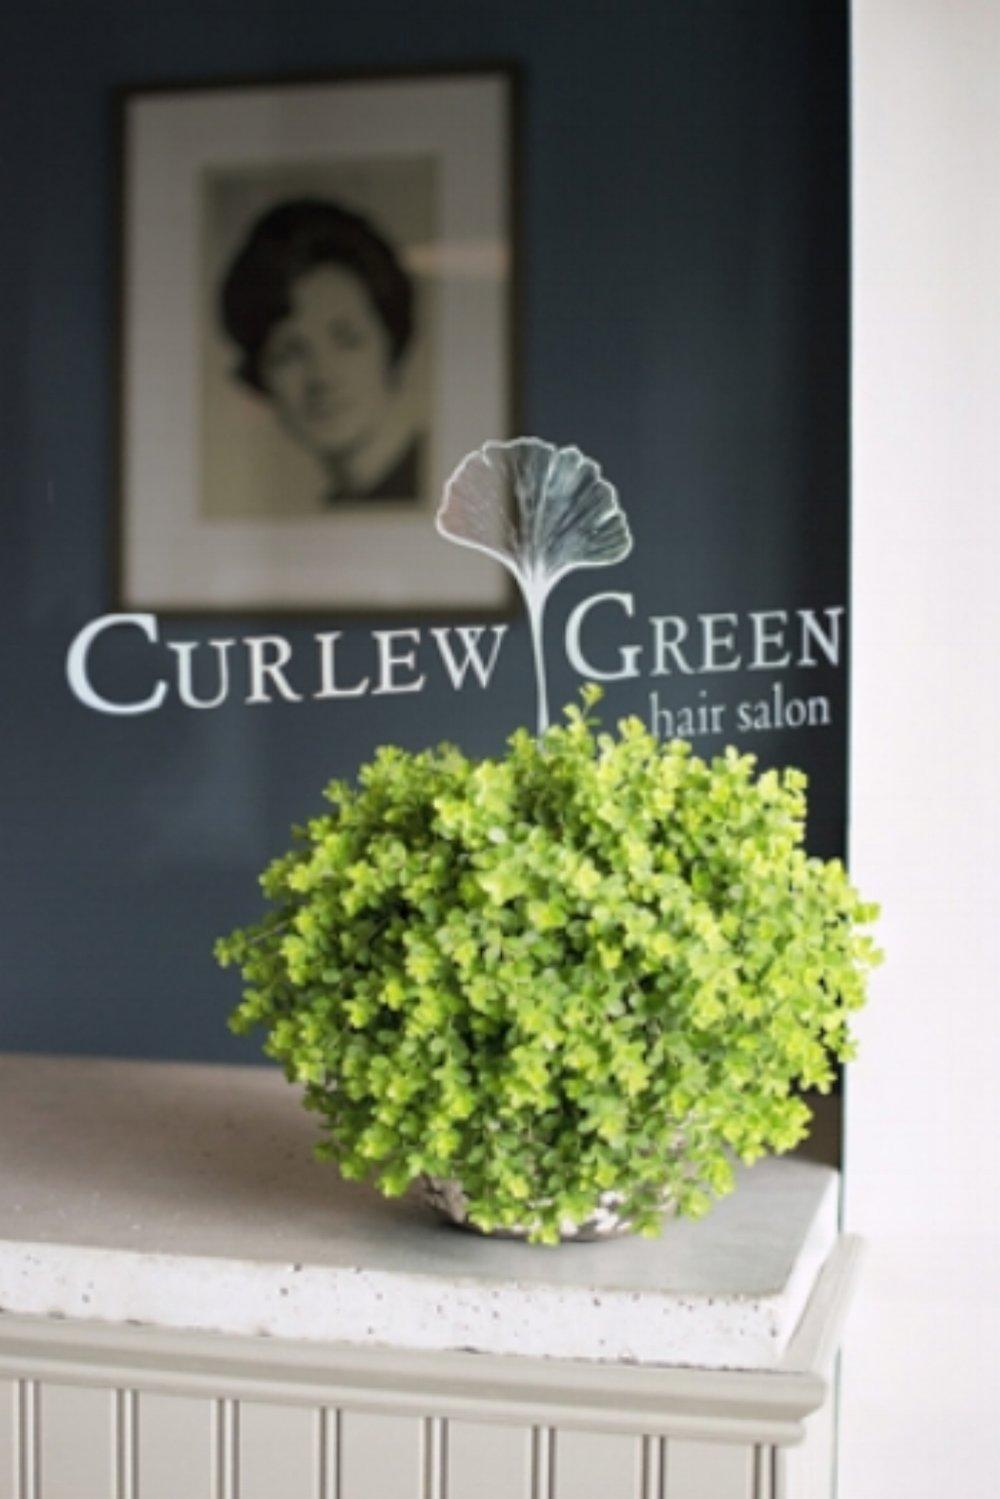 Salon Details Curlew Green